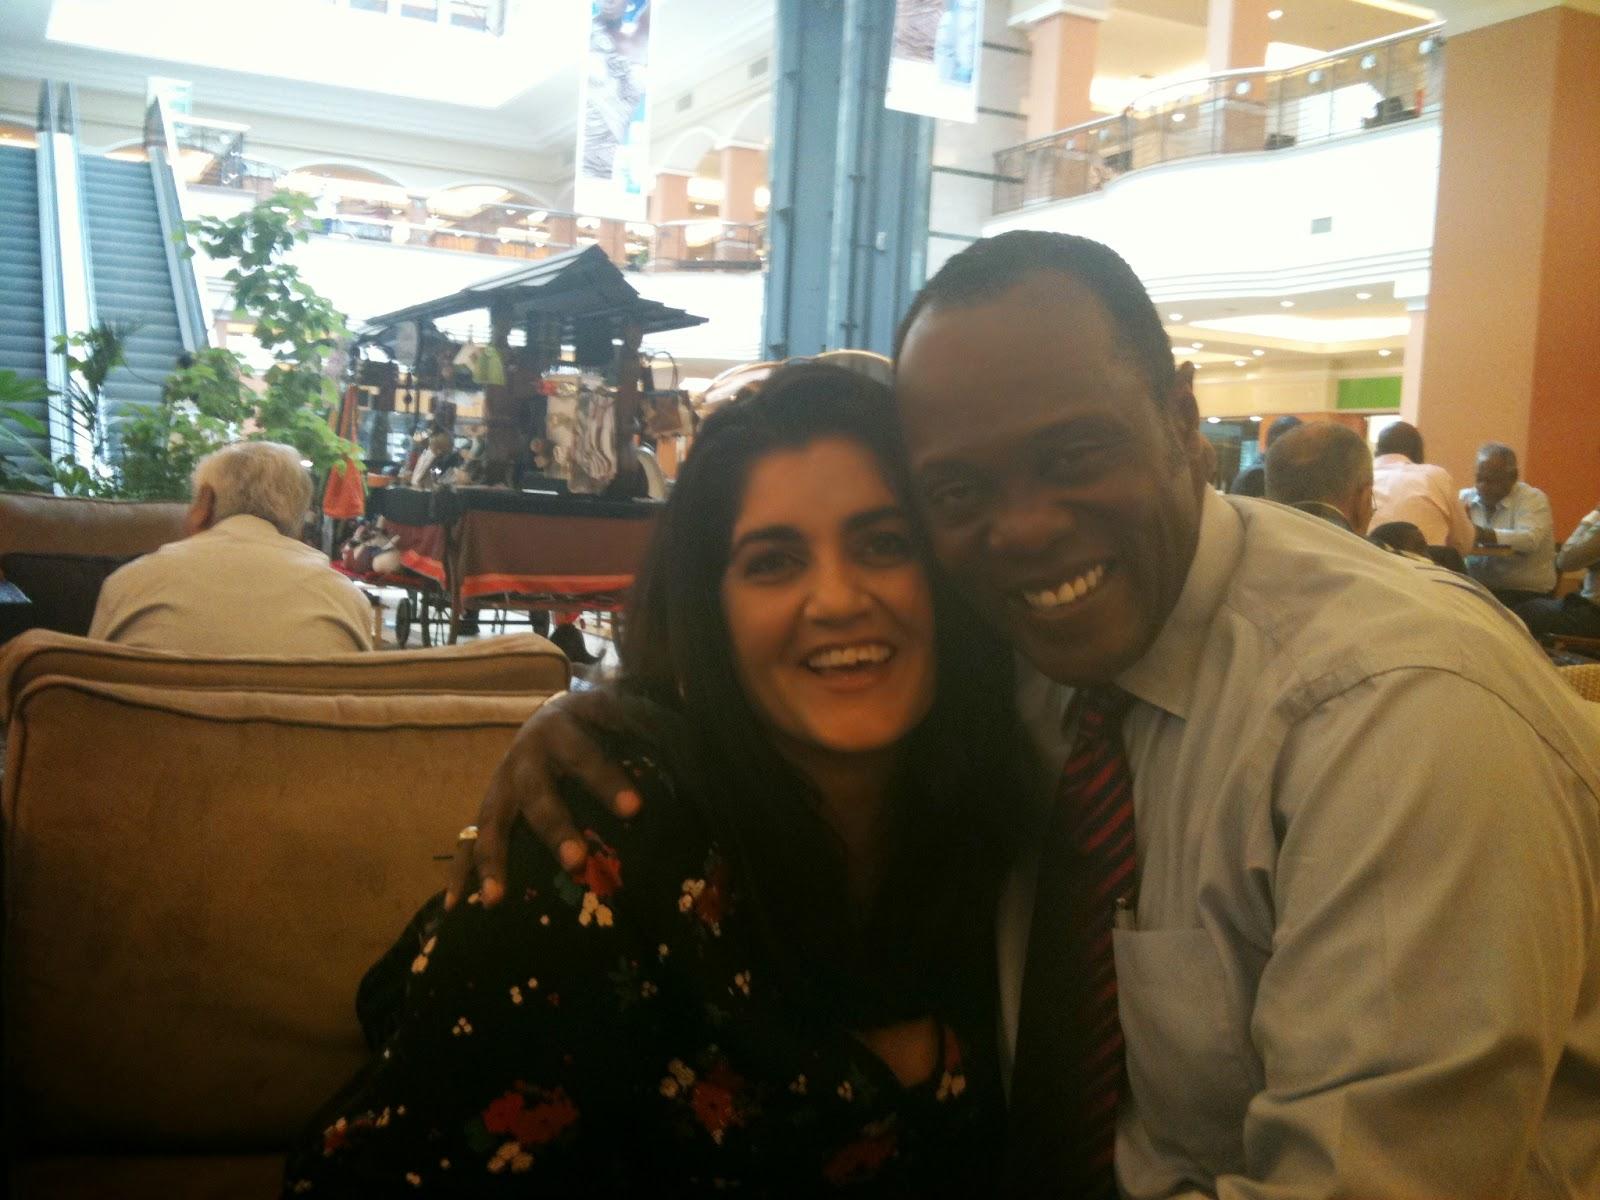 Friday, June 27, 2014 – Kenya's leading journalist, Jeff Koinange